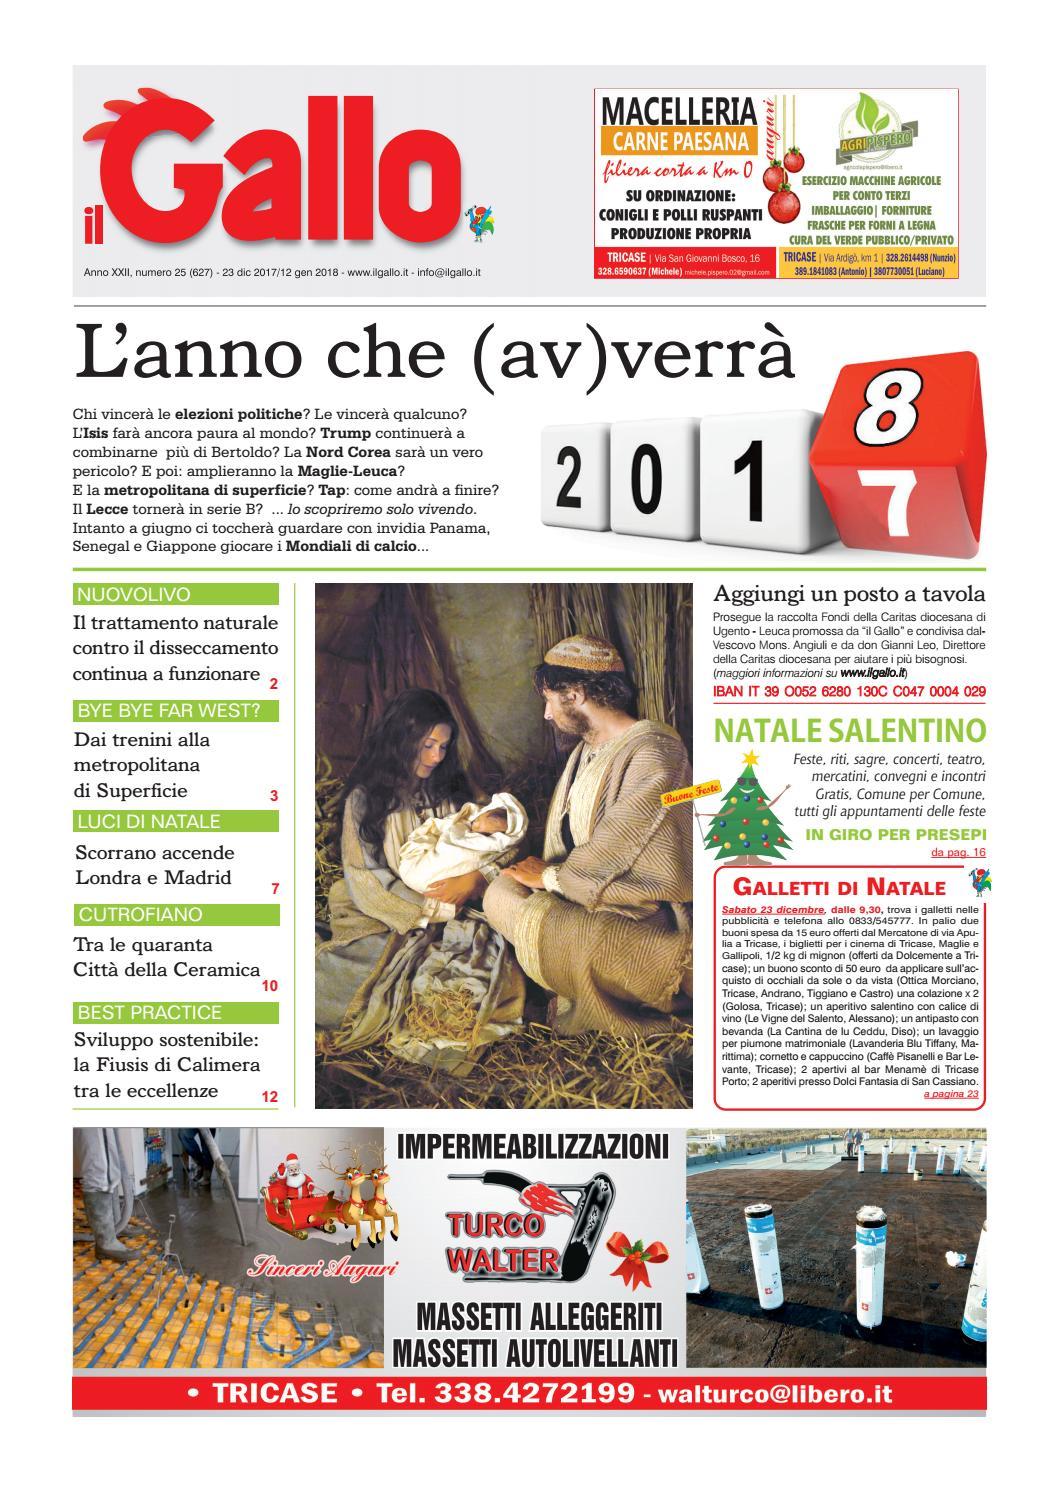 17 Ilgallo25 By Giuseppe Issuu Cerfeda stxChQrd